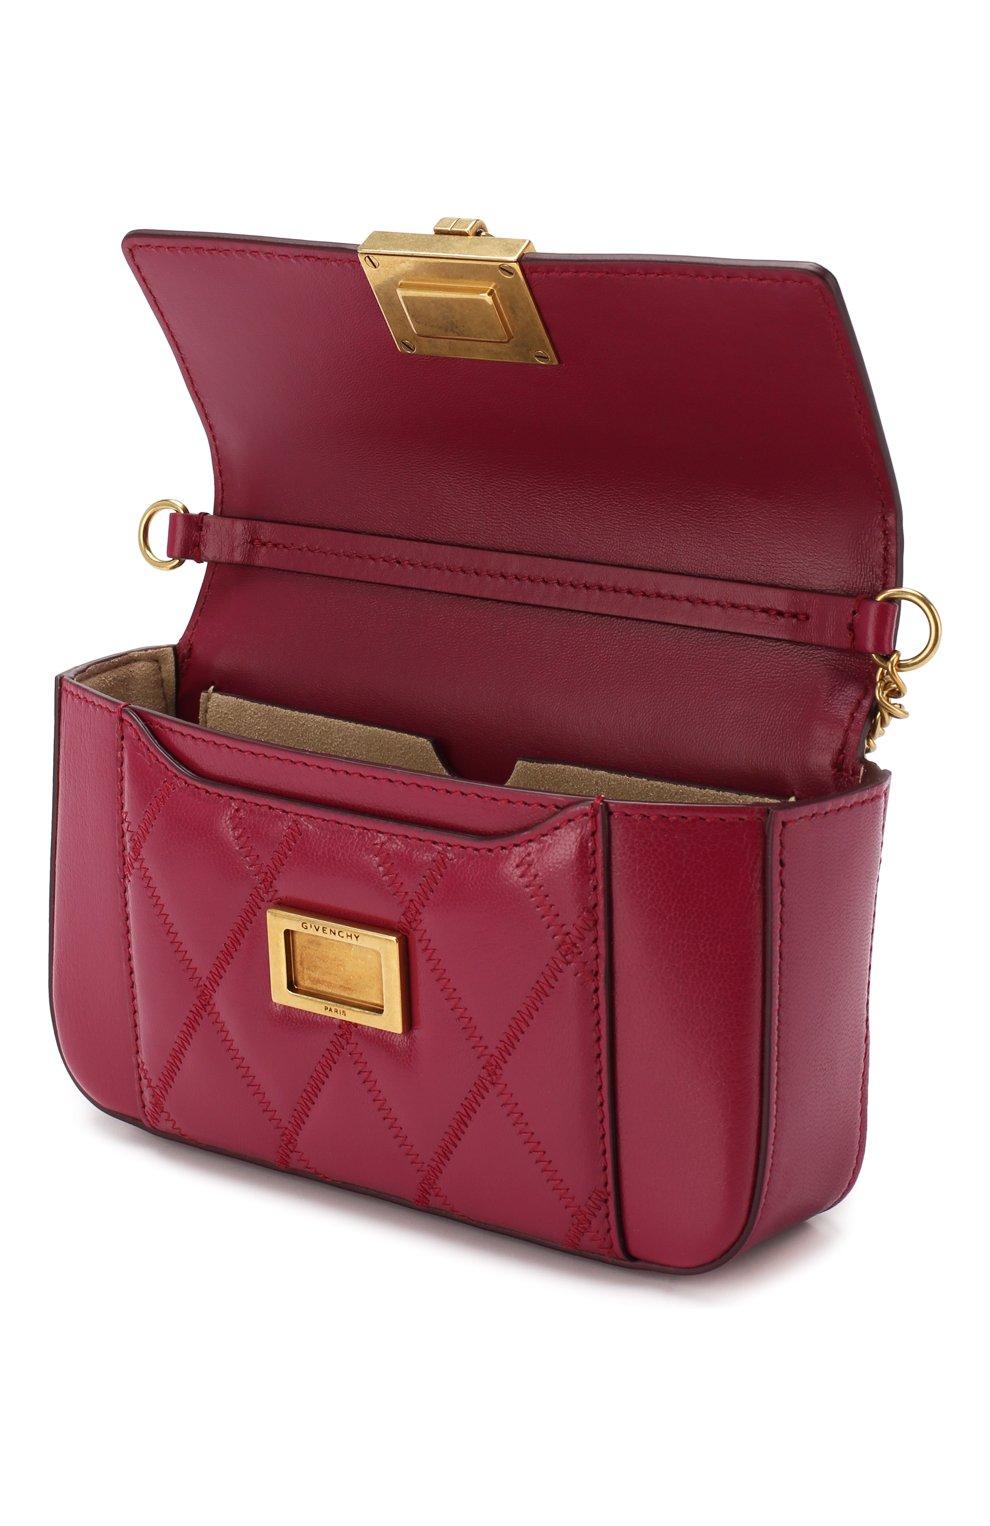 Поясная сумка Pocket Givenchy фиолетовая | Фото №4